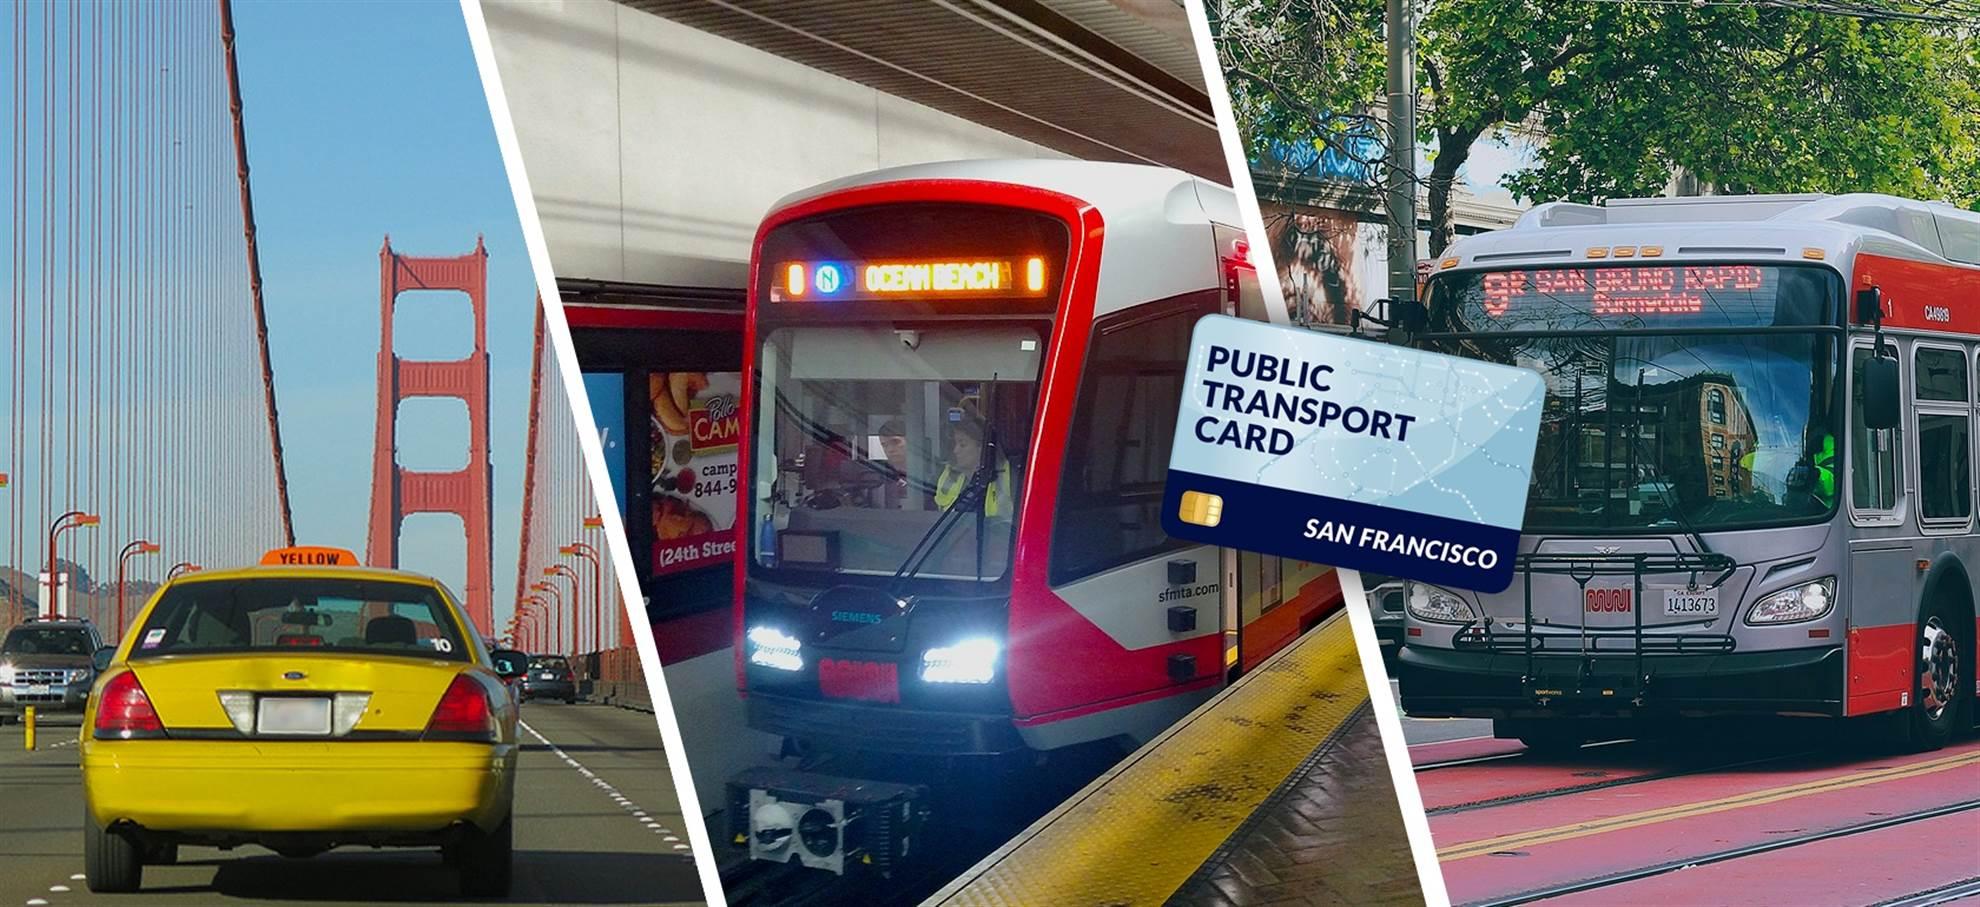 San Francisco Public Transportation Card (+Airport Transfer)